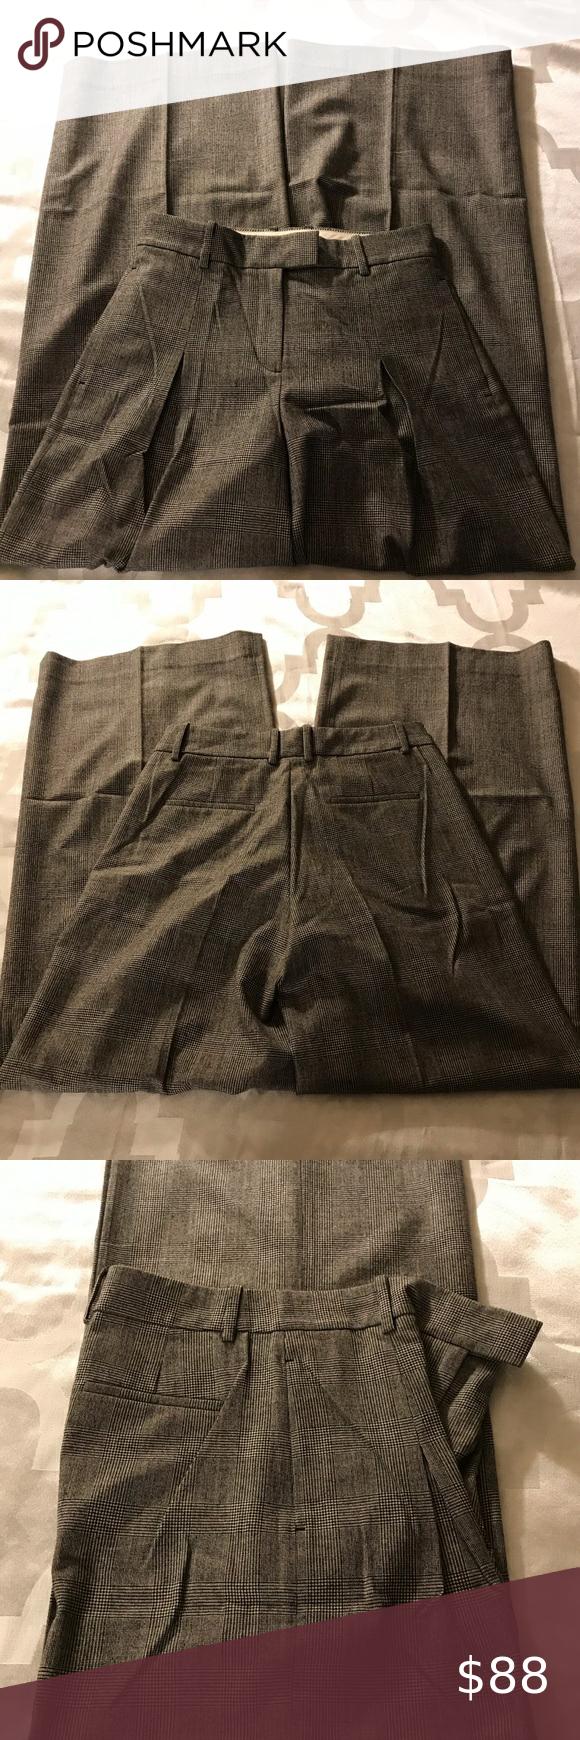 J Crew High Waist Wide Leg Plaid Trousers Printed Wide Leg Pants Wide Leg Linen Pants Cropped Linen Pants